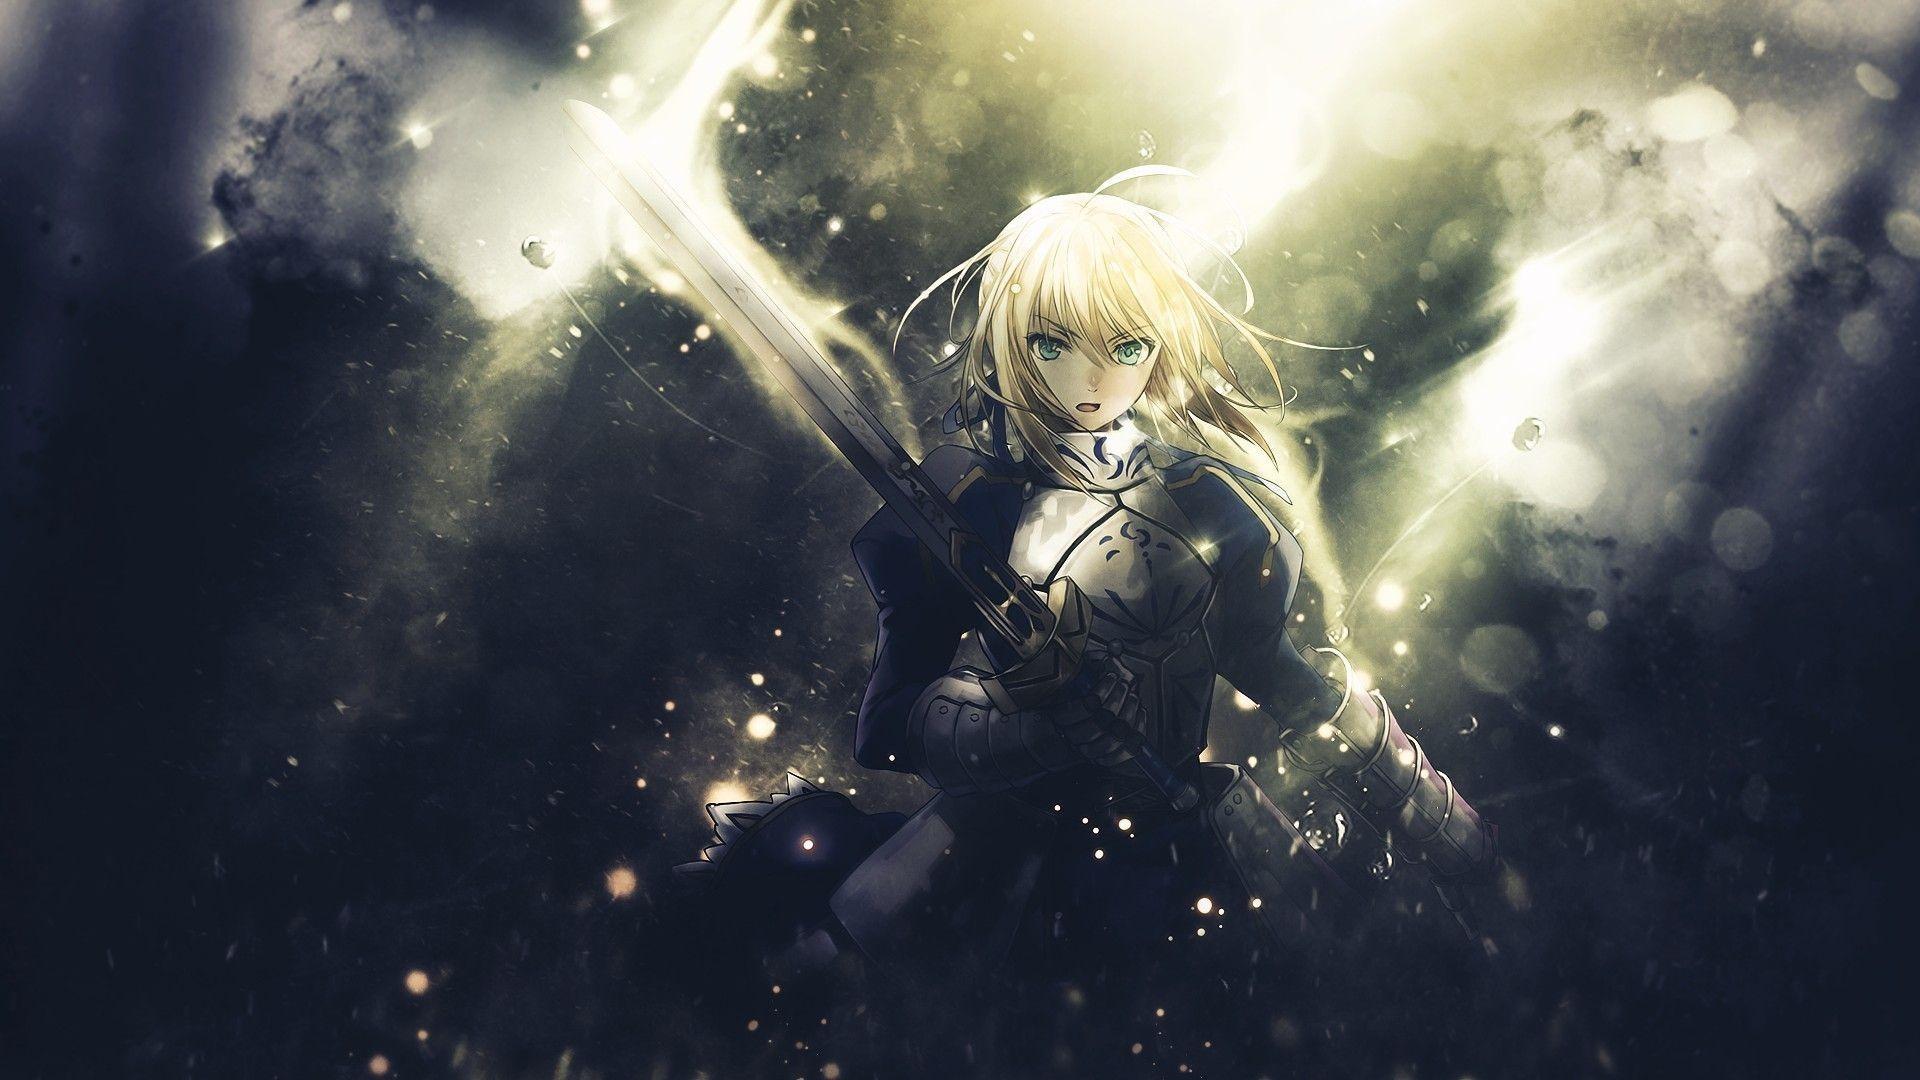 Fate Zero full hd wallpaper